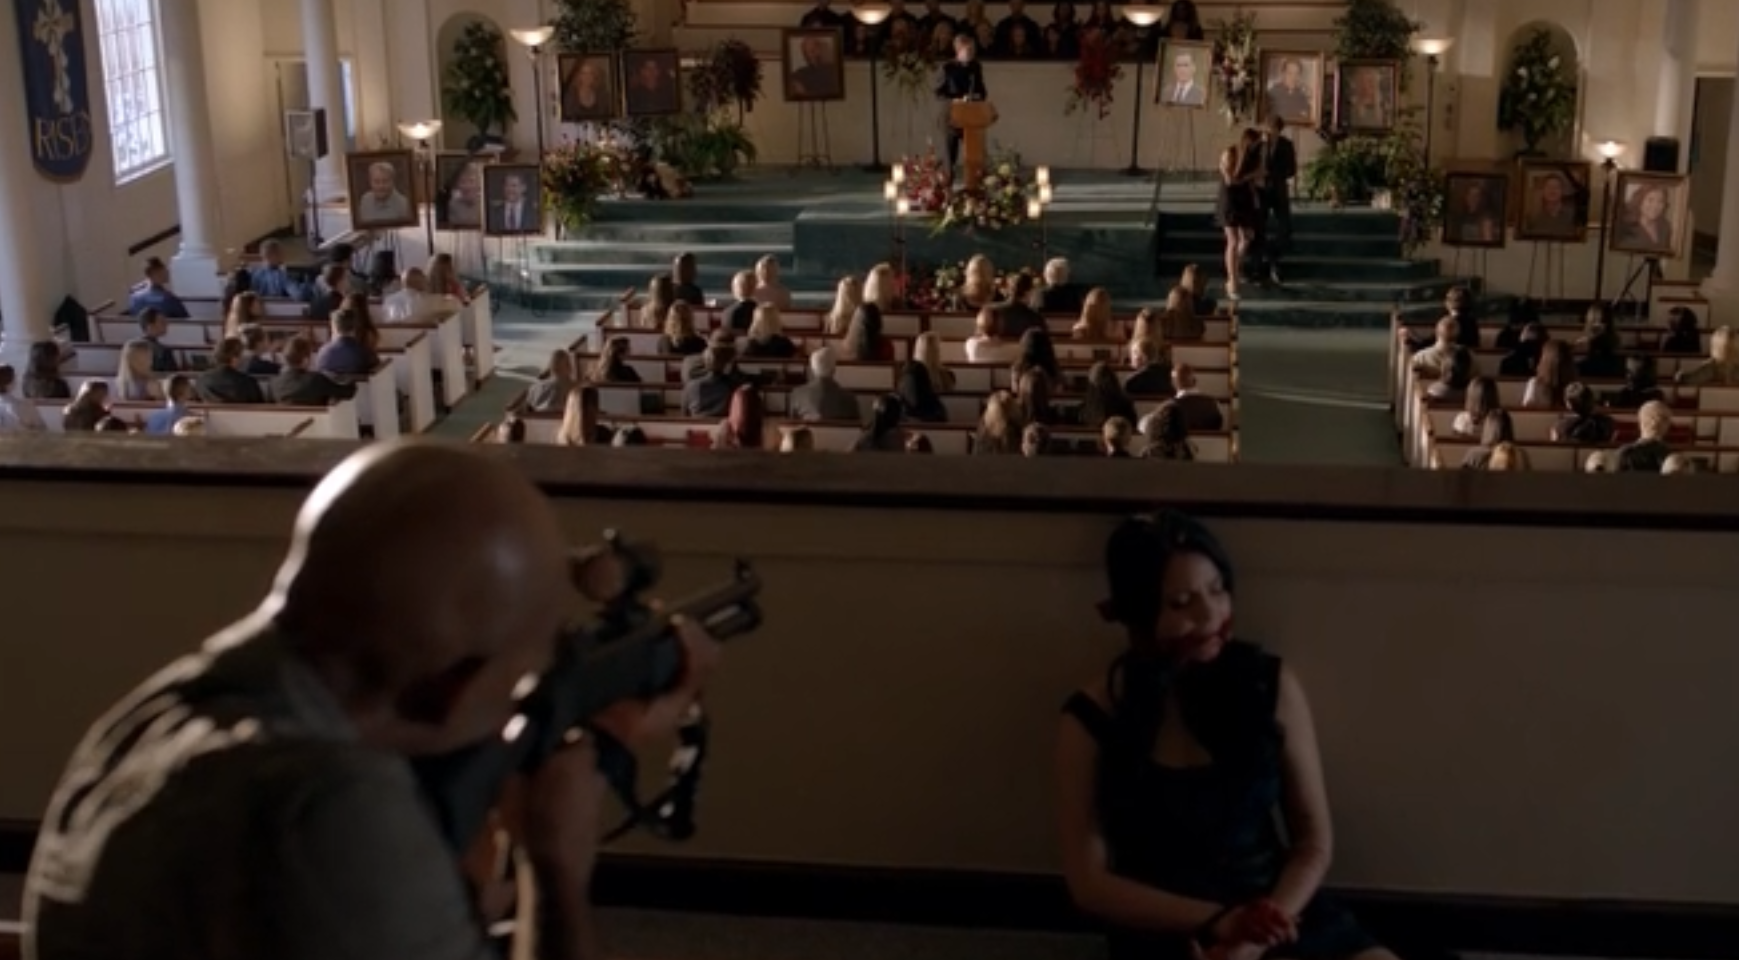 The Vampire diaries S04E02 - tension